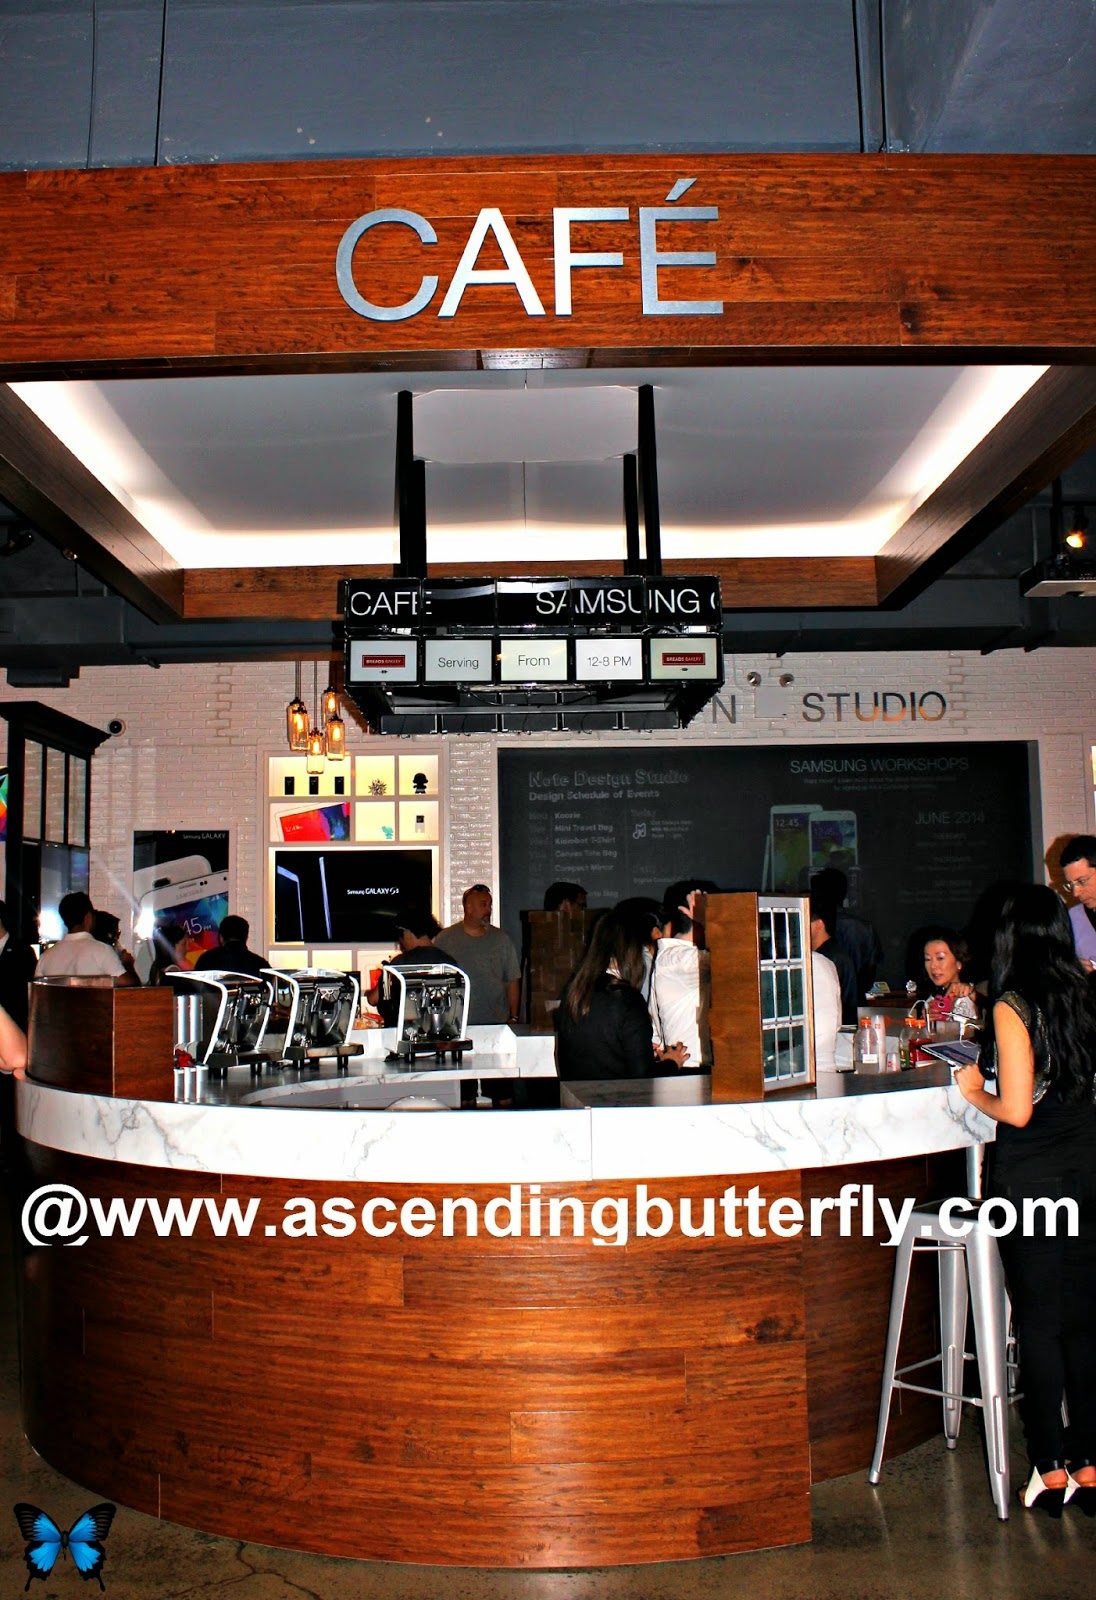 Cafe at the SoHo Samsung Galaxy Studio